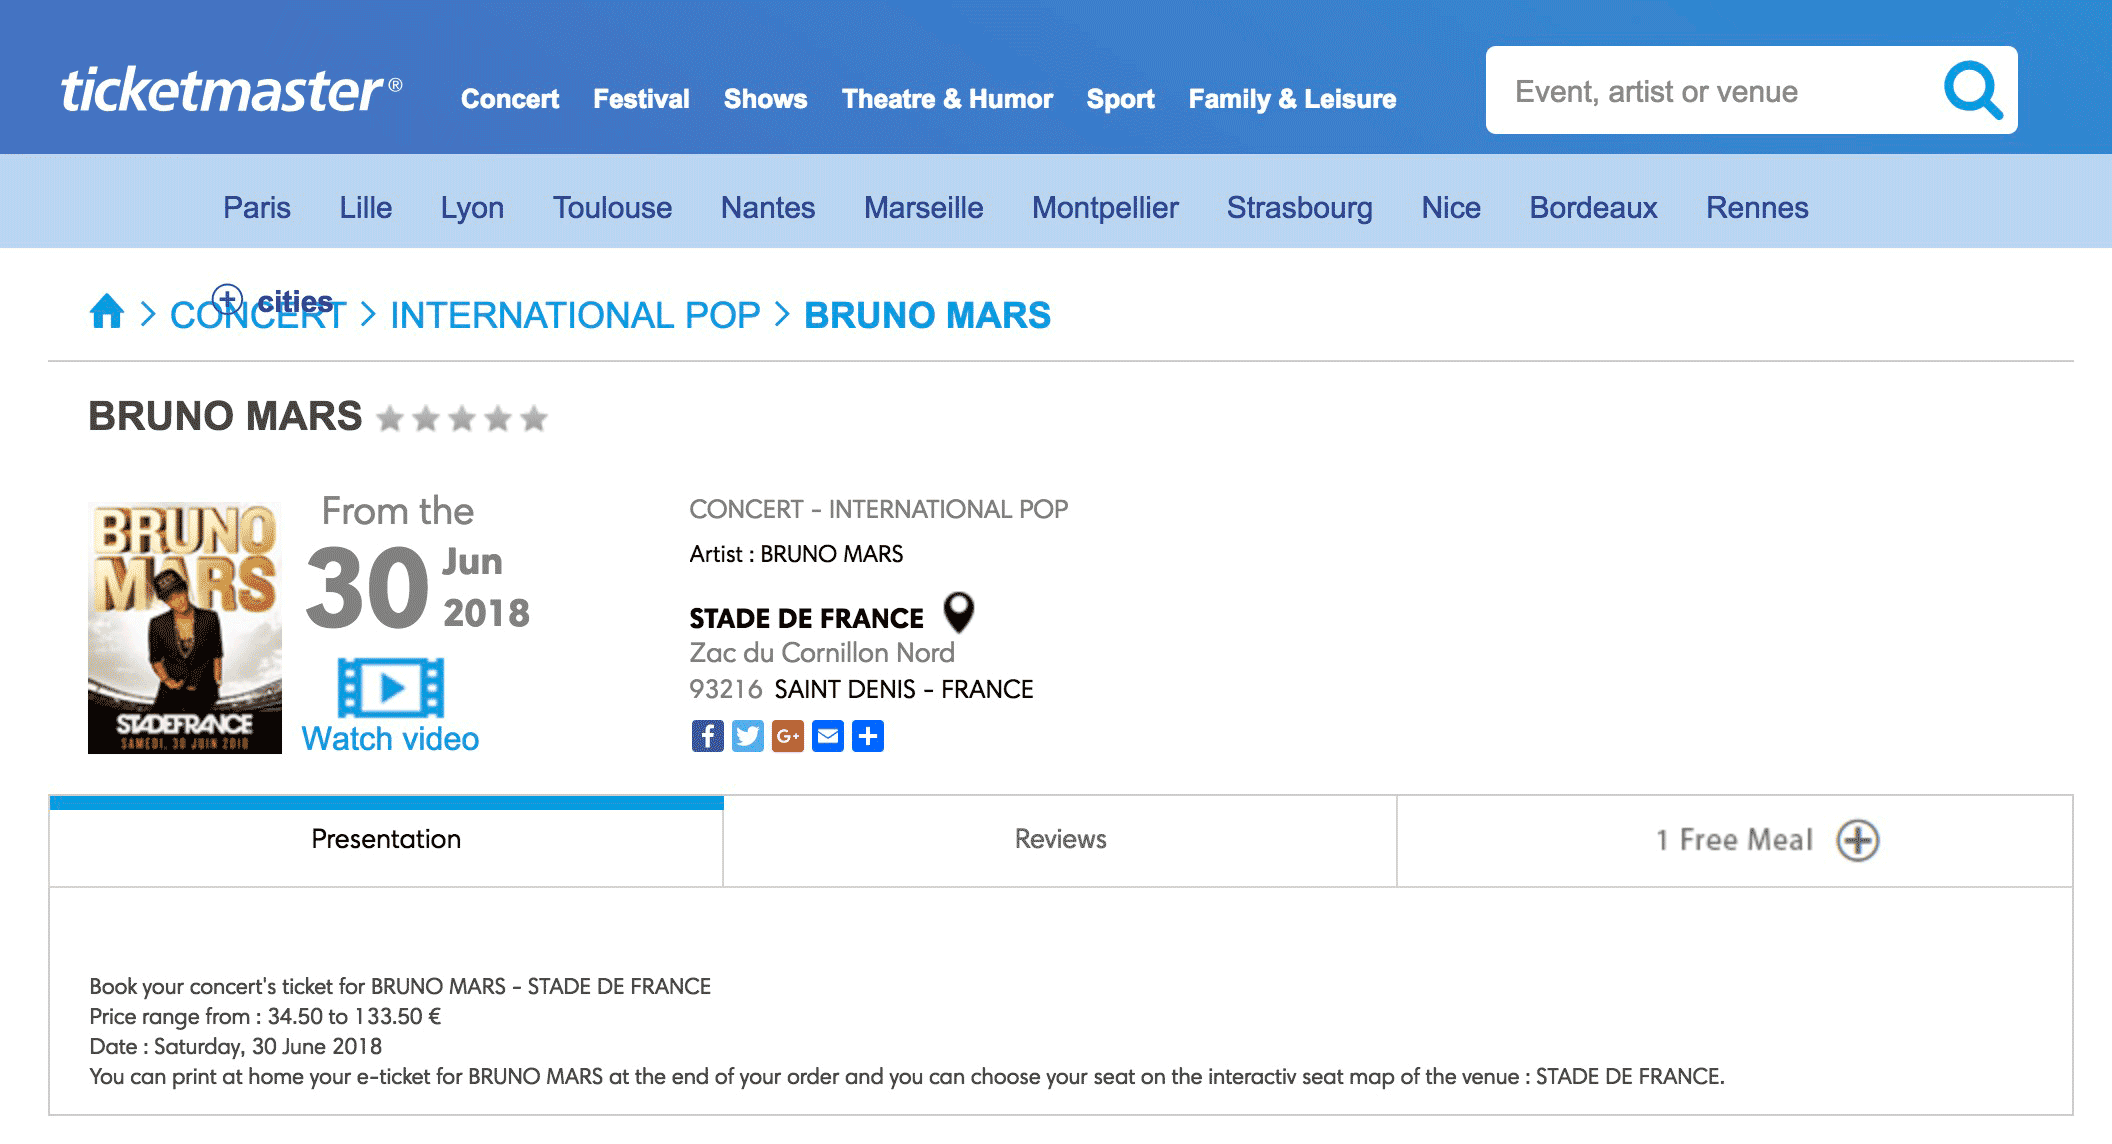 Сайт, на котором продают билеты на концерт Бруно Марса в Париже